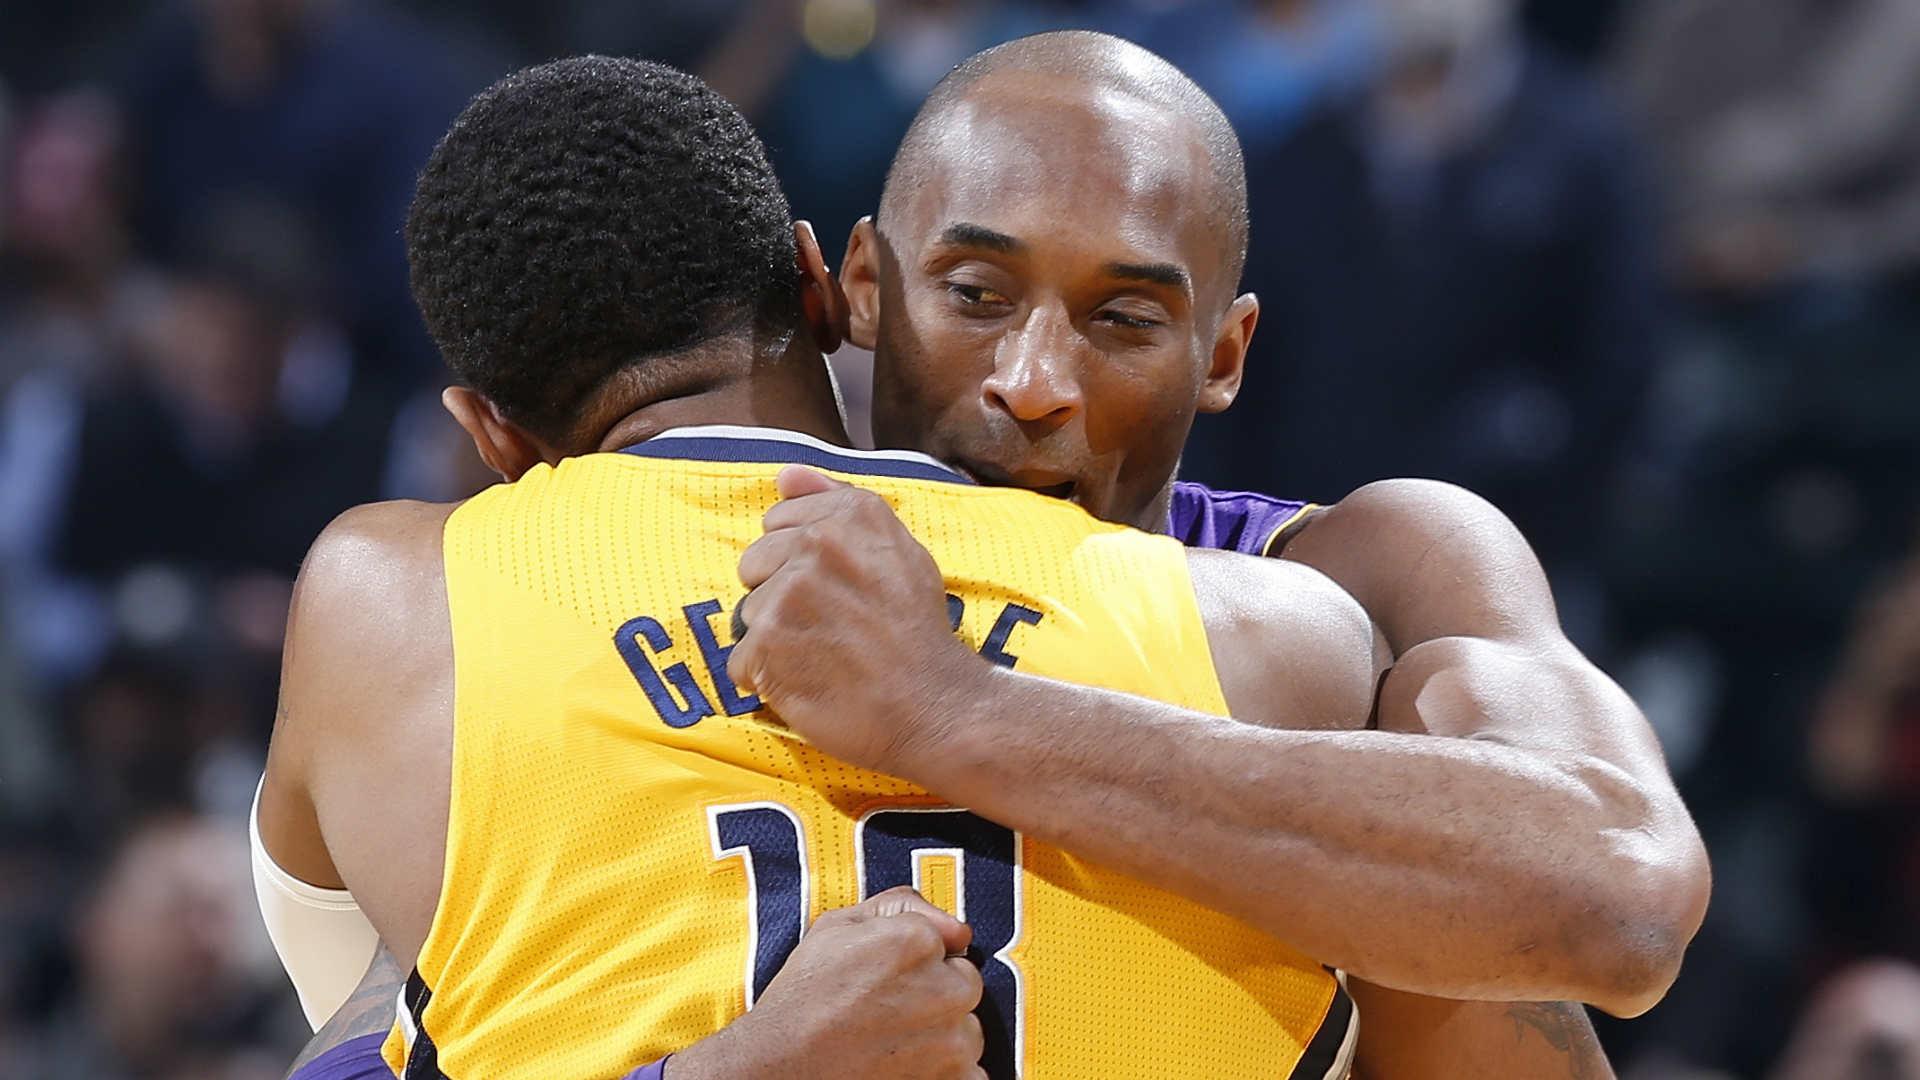 Paul George beat Kobe Bryant for game-winner because 'he is old' | NBA |  Sporting News